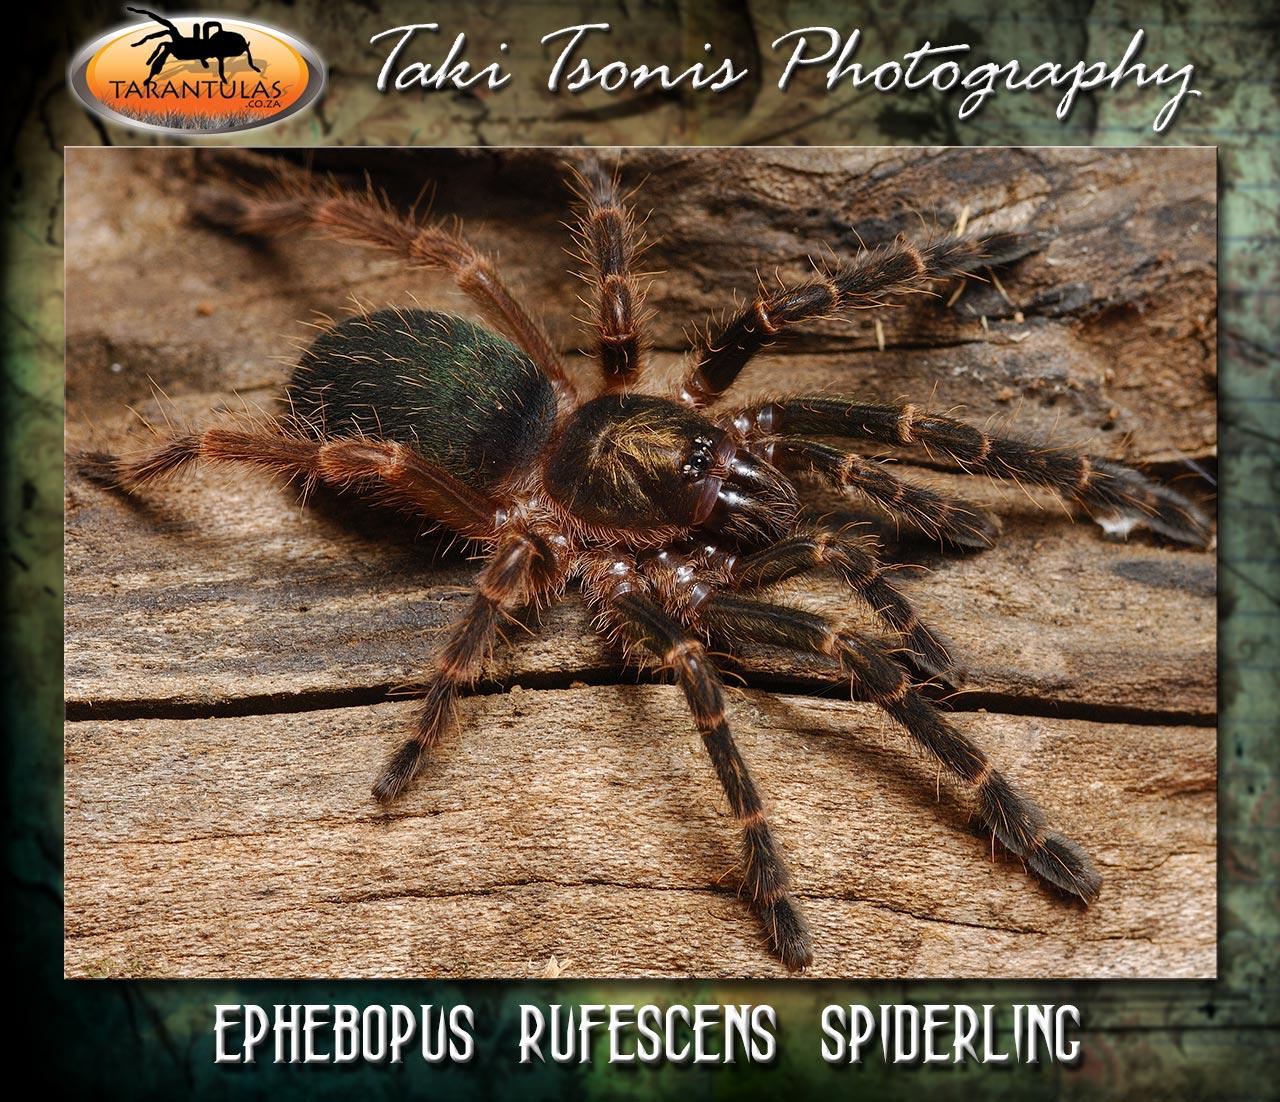 Ephebopus rufescens